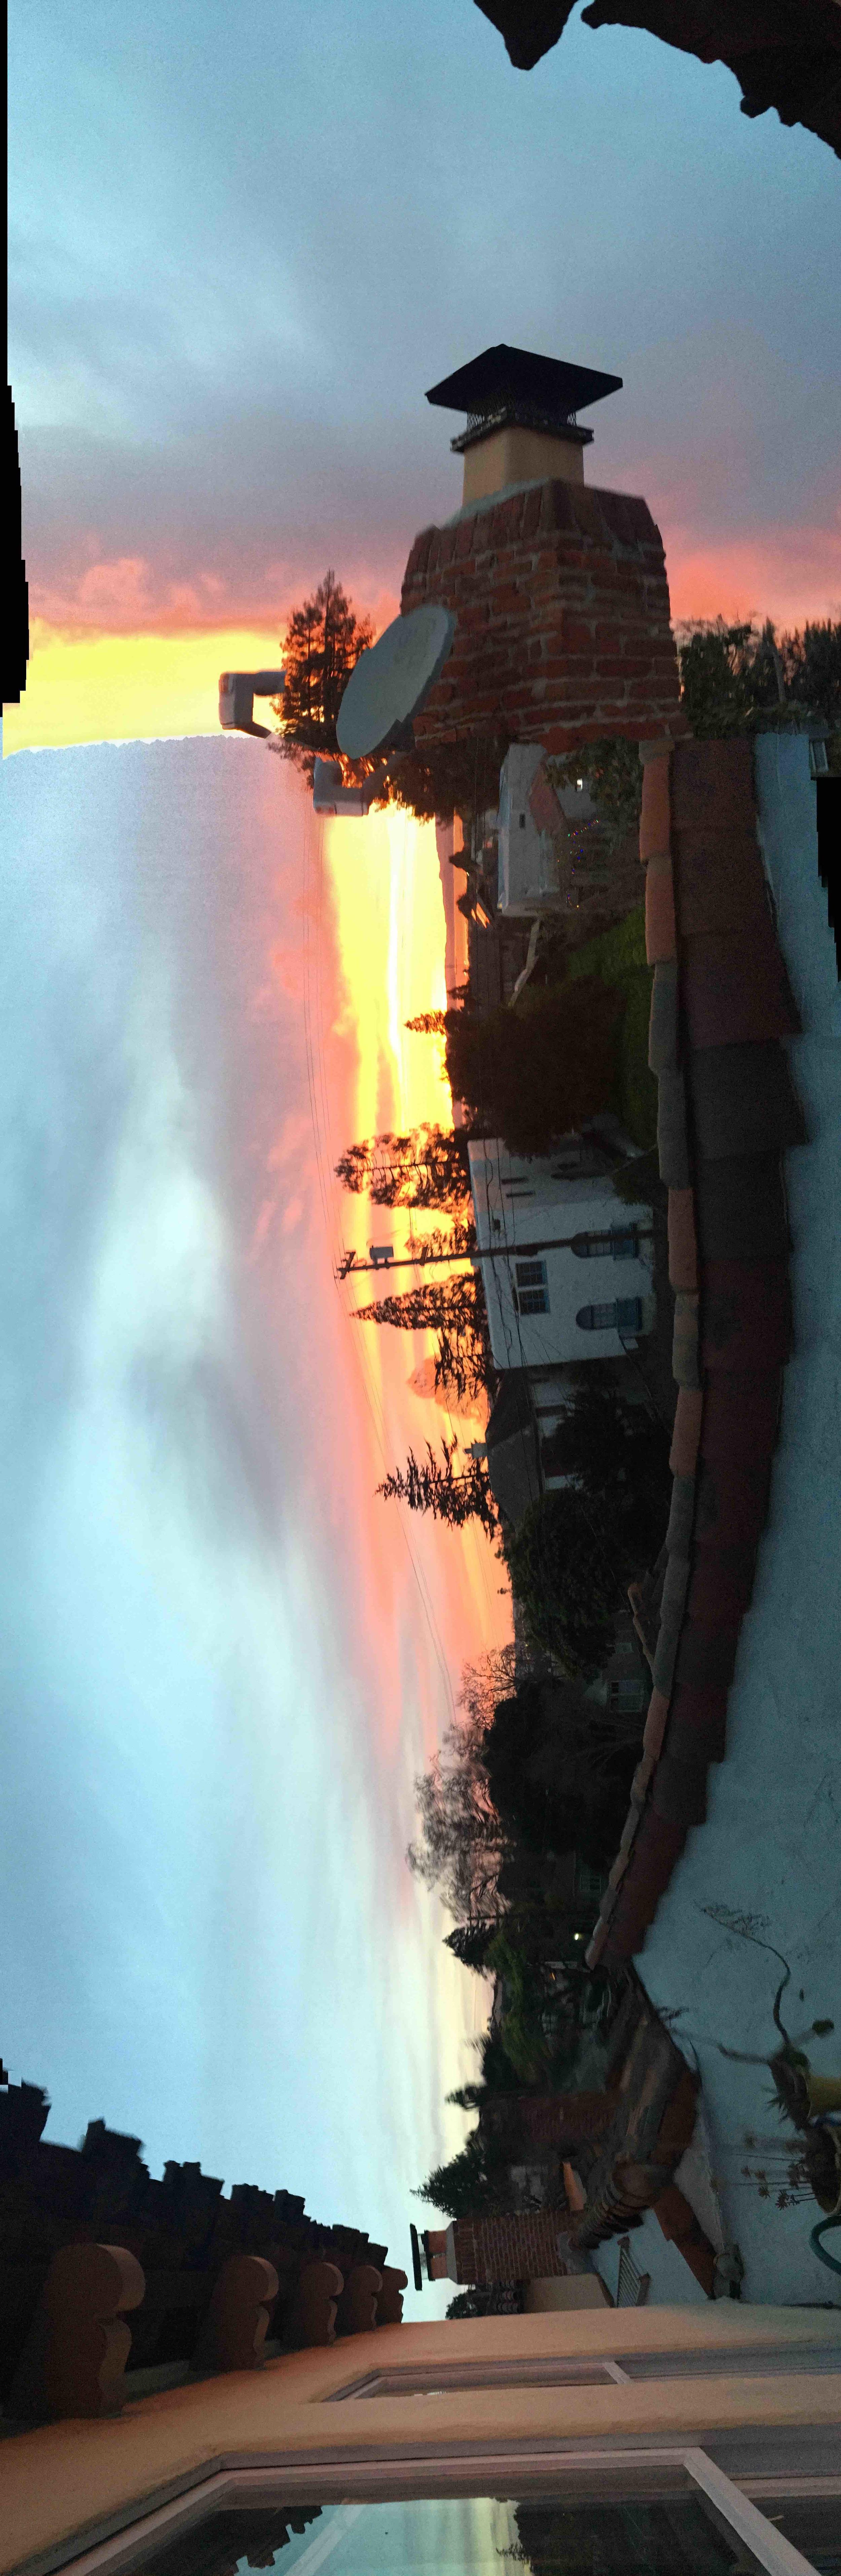 Leap Sunset, 29 February, 2016  Photograph;  Copyright © Tennyson Woodbridge, 1963 to present